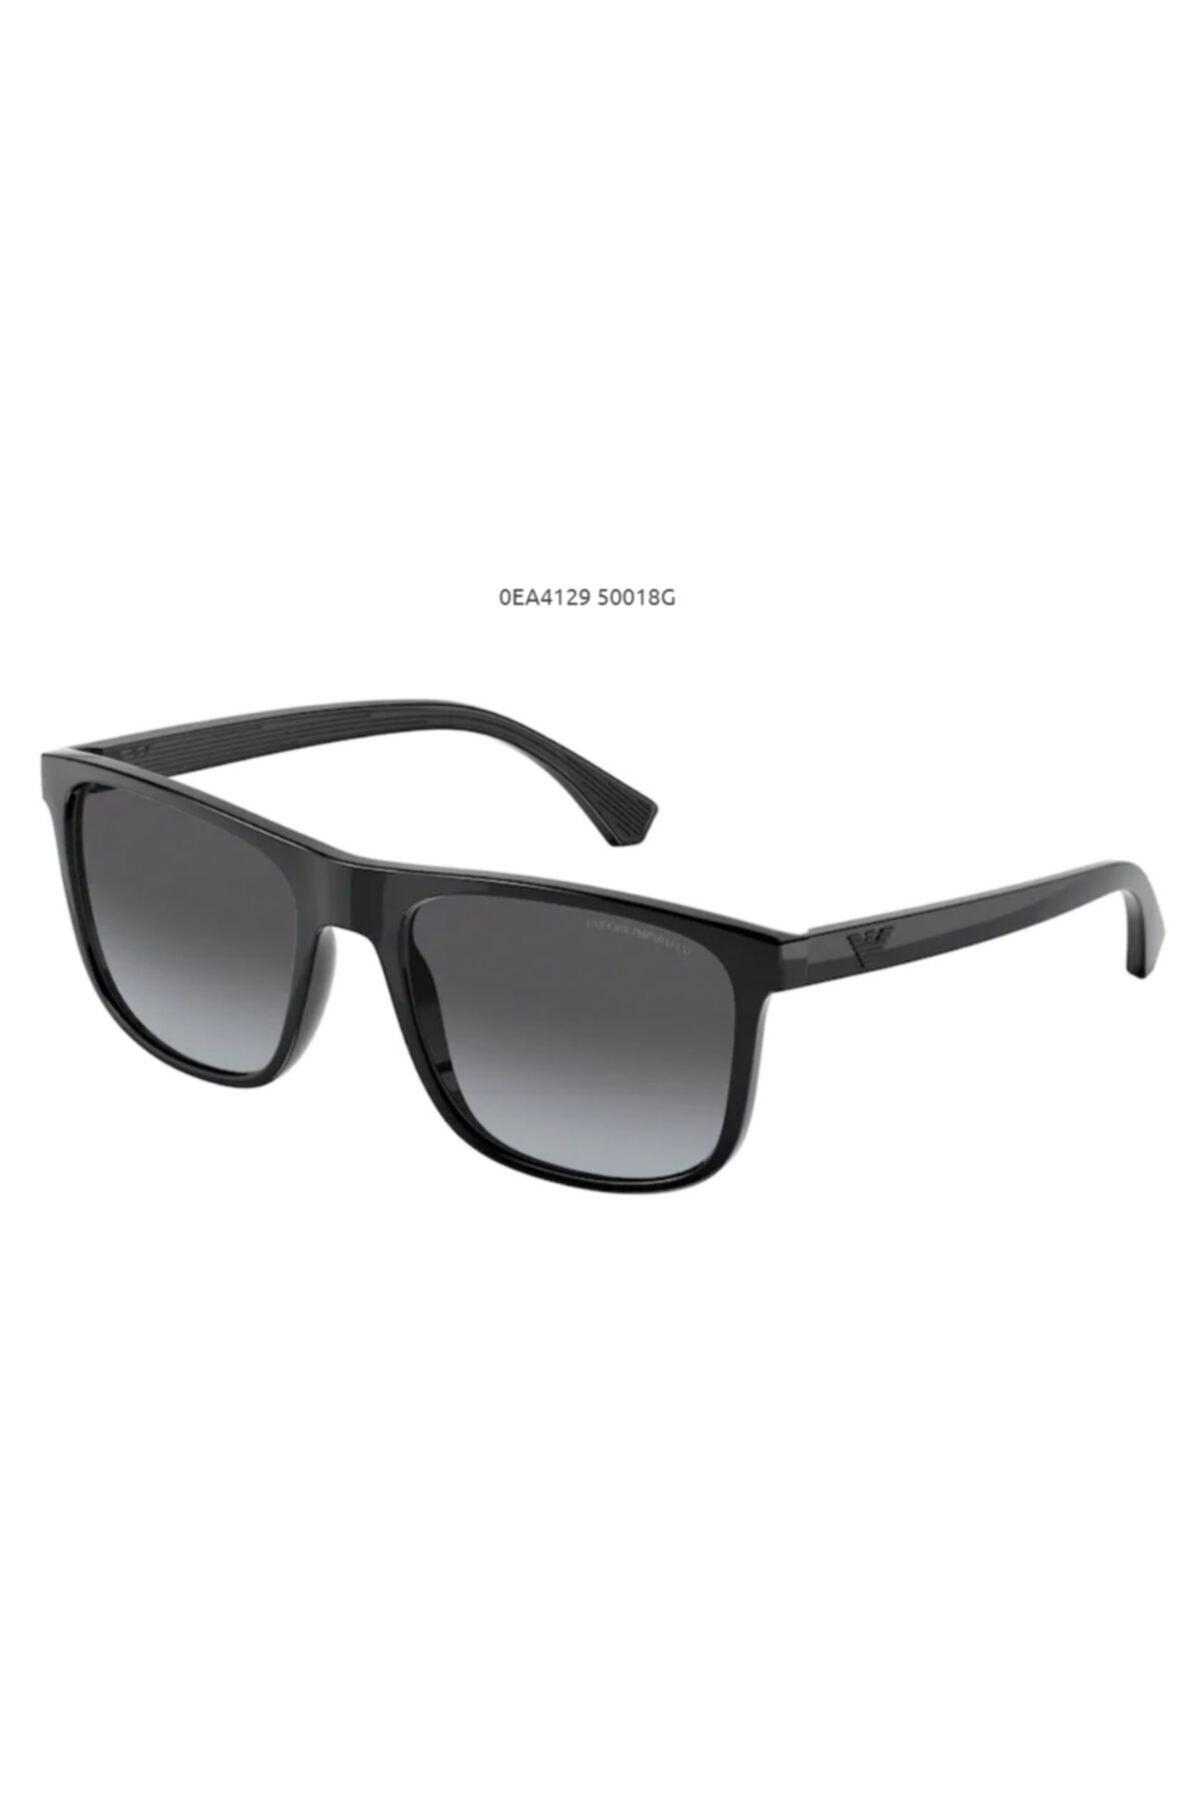 خرید نقدی عینک آفتابی زنانه ترک برند امپریو آرمانی رنگ مشکی کد ty94537344